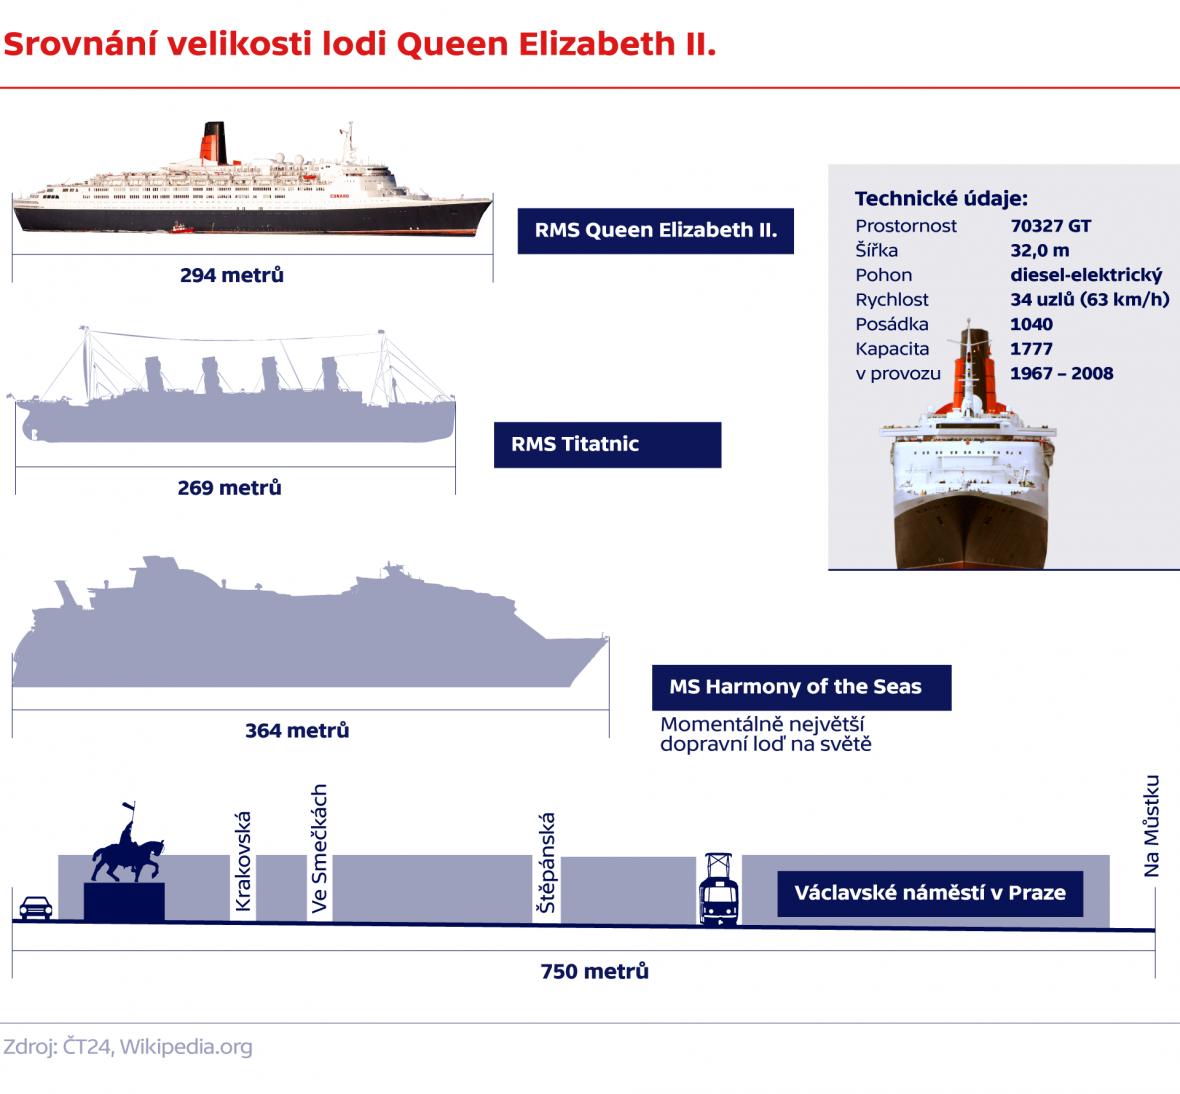 Srovnání velikosti lodi Queen Elizabeth II.